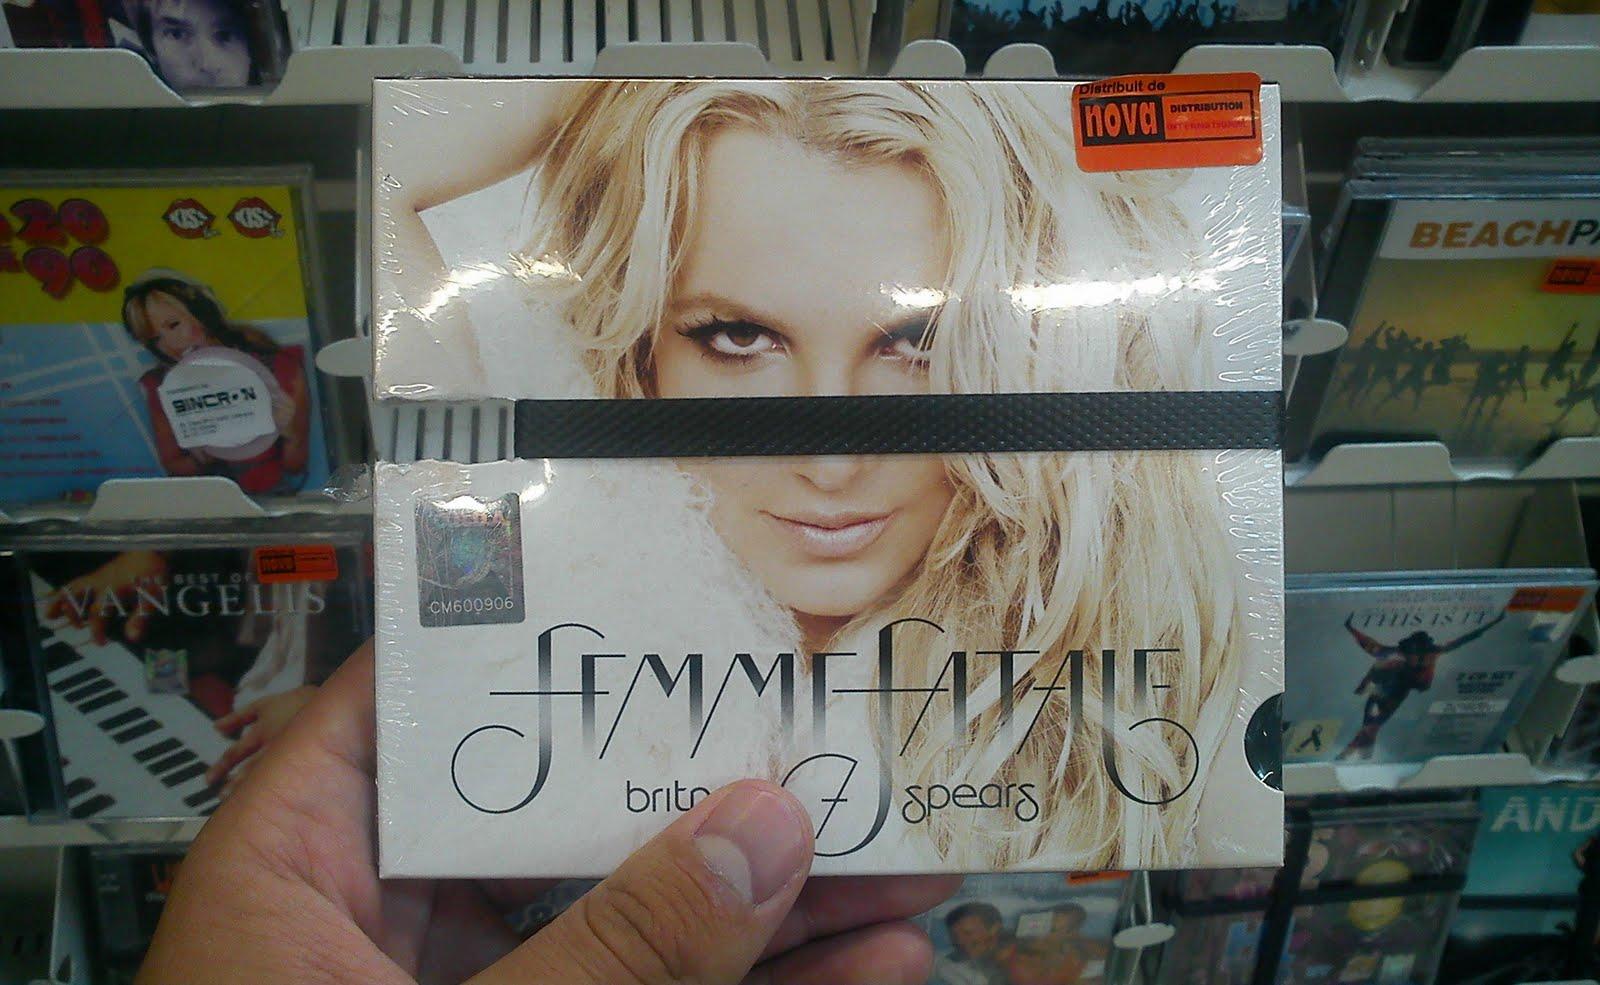 http://4.bp.blogspot.com/-mOOUOYEFf3Q/TjYU-VfixRI/AAAAAAAACx4/tyYaCe47ag4/s1600/Britney+Spears+Femme+Fatale+Carrefour.jpg